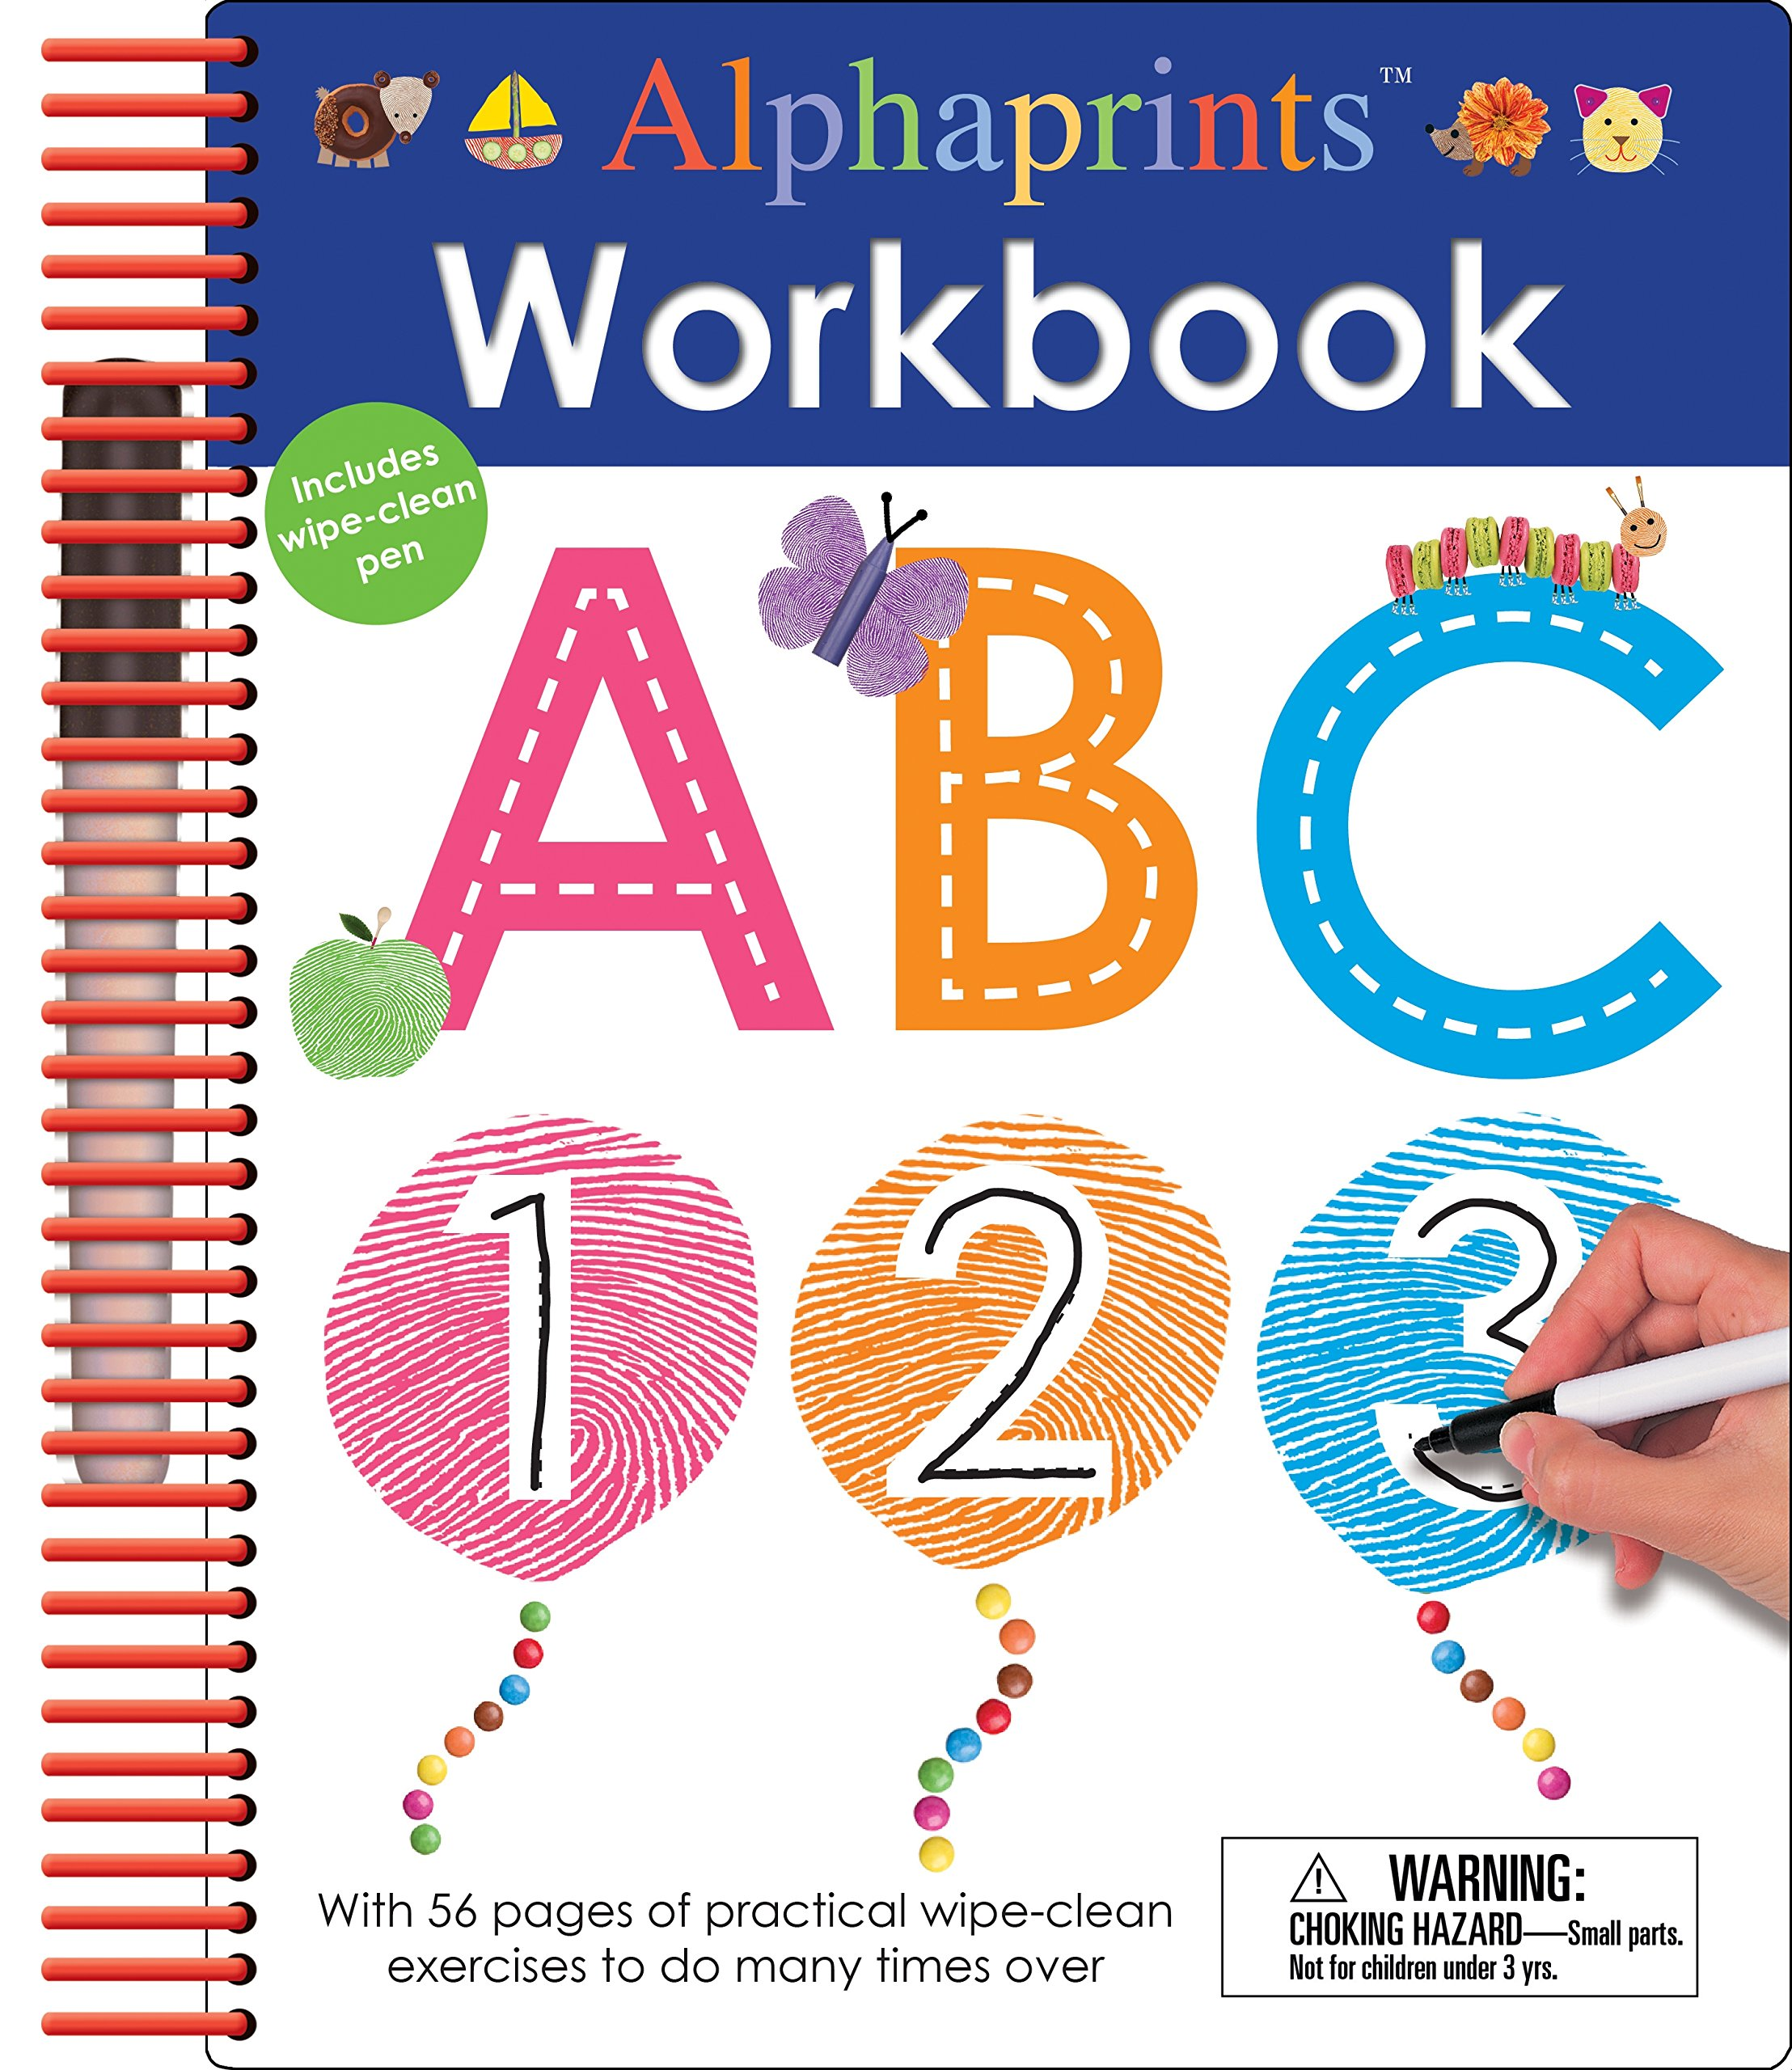 Alphaprints Clean Workbook Activity Books